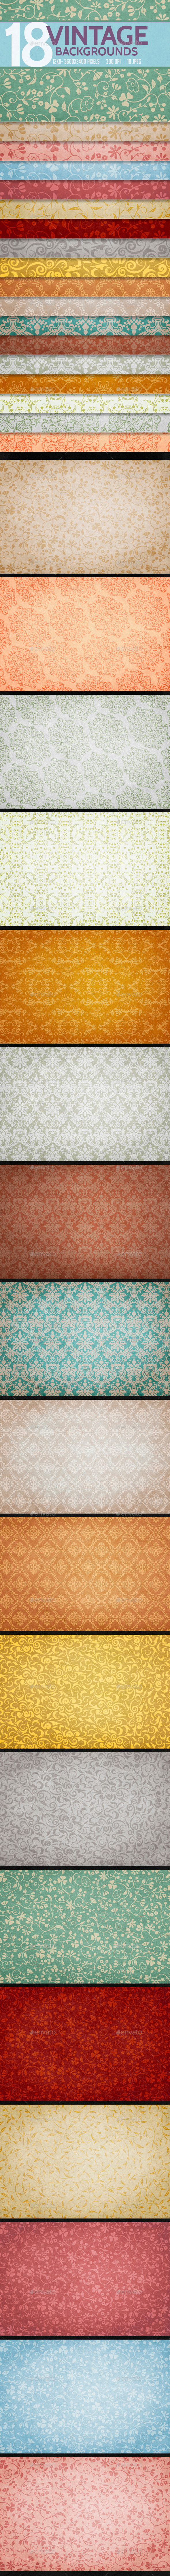 GraphicRiver Vintage Backgrounds 9921460